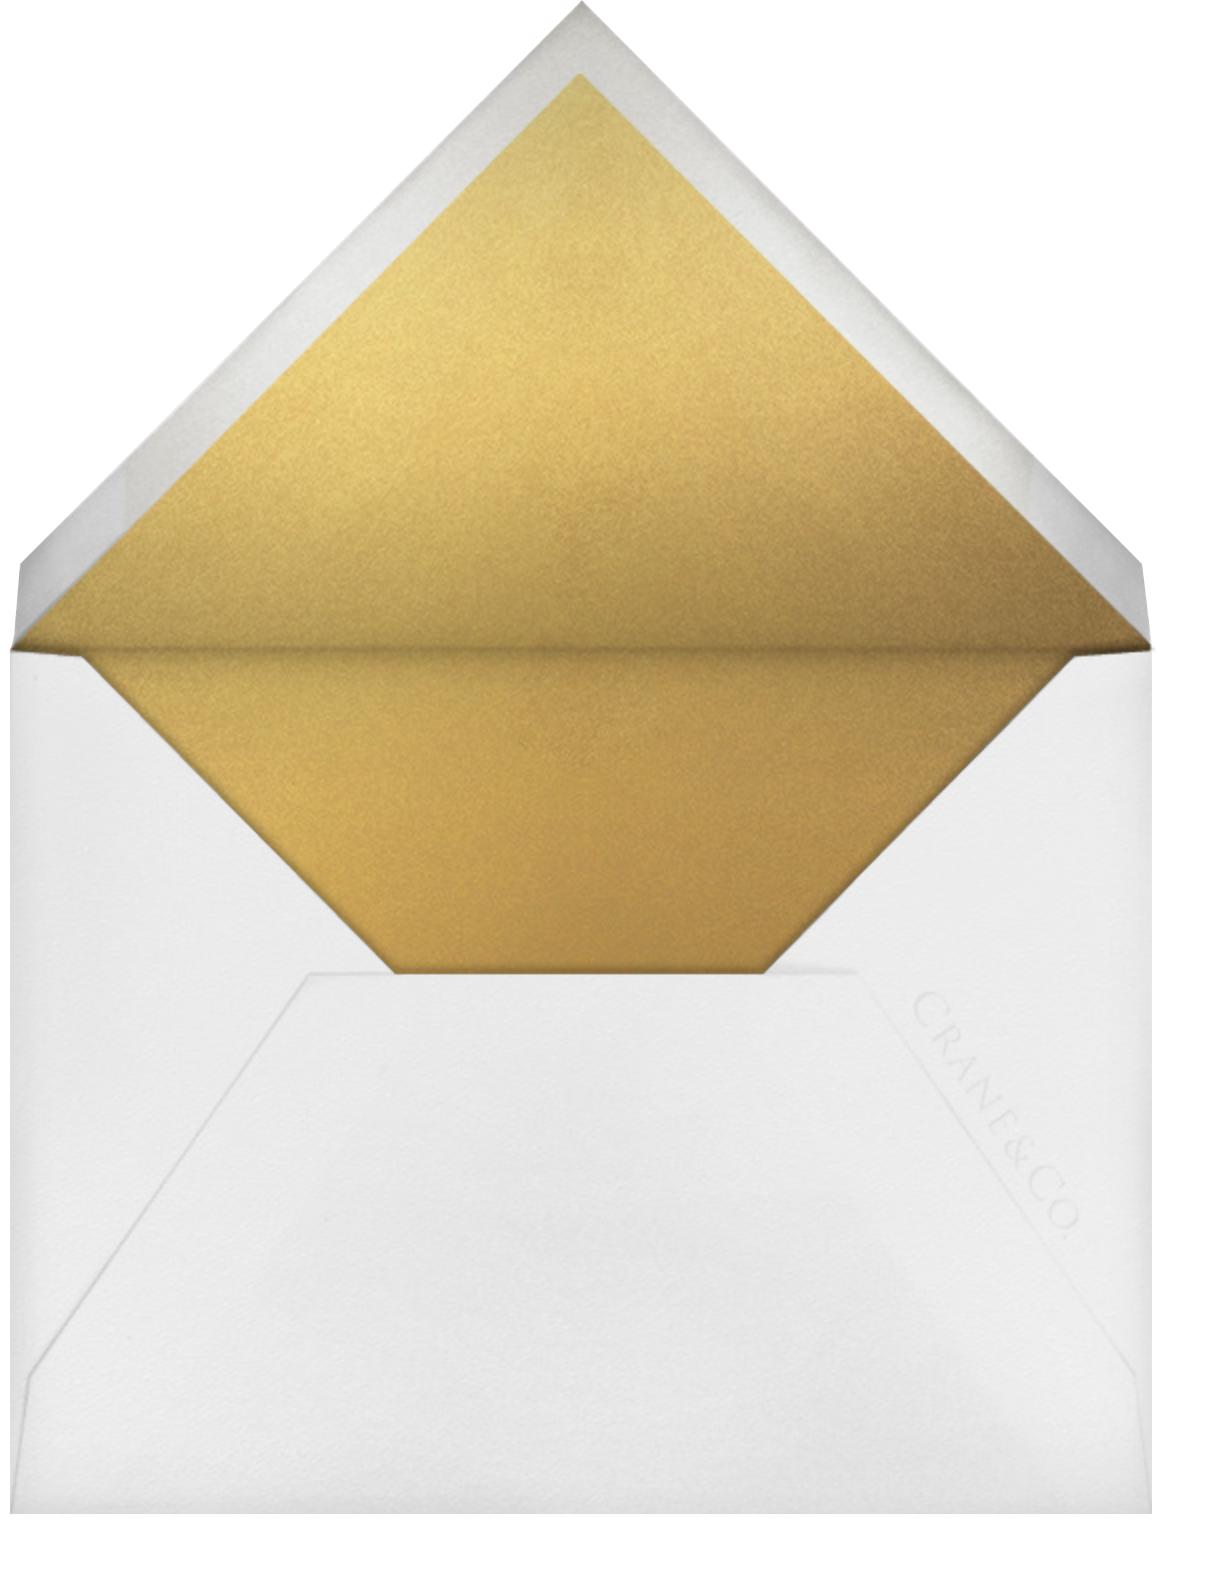 Prelude (Stationery) - Gold - Vera Wang - Wedding - envelope back